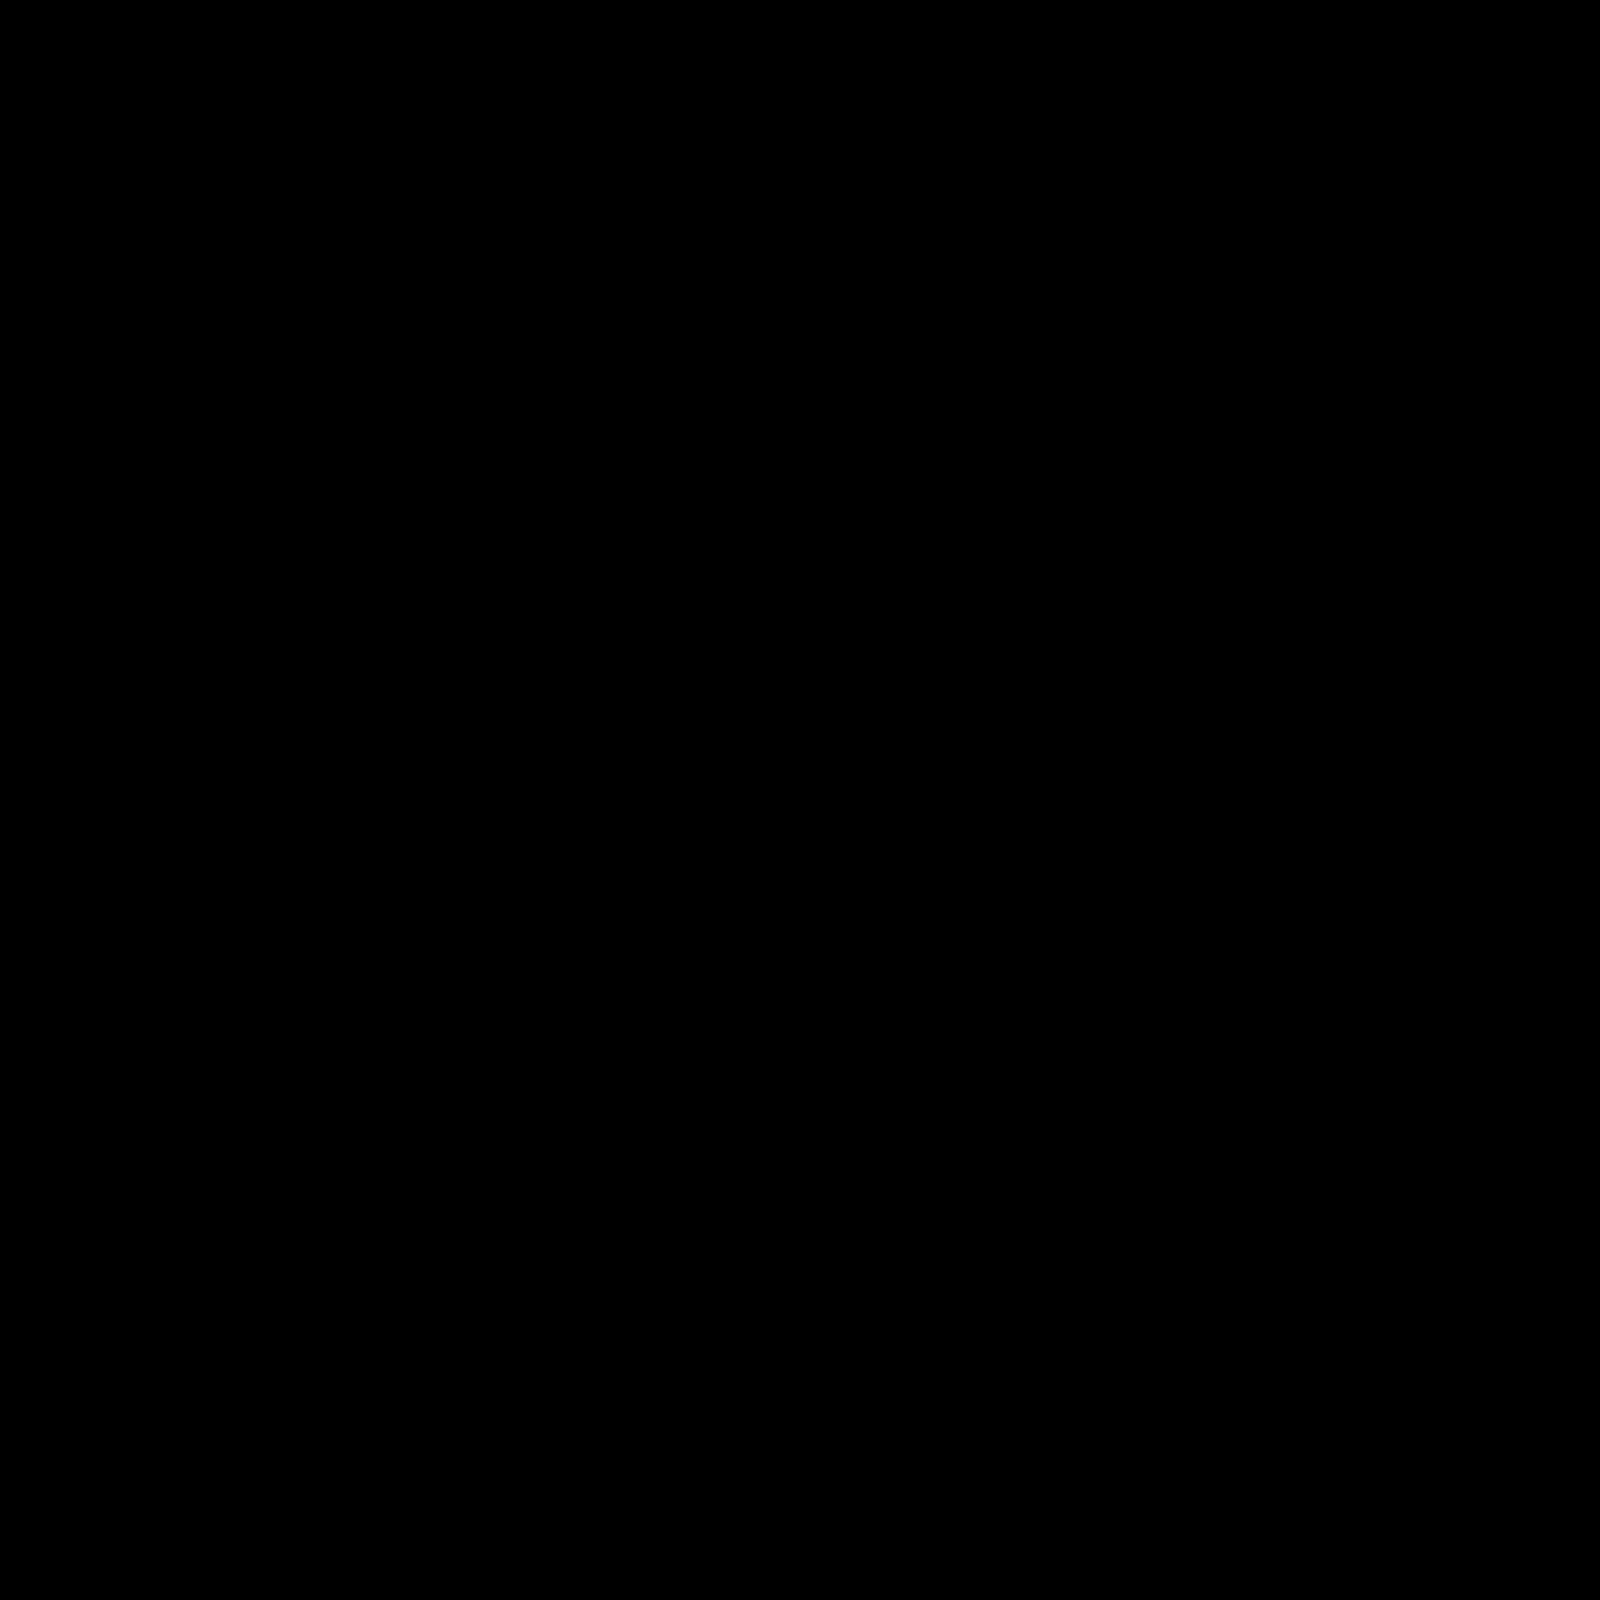 clip art free stock Pillars vector black and white. Greek pillar icon free